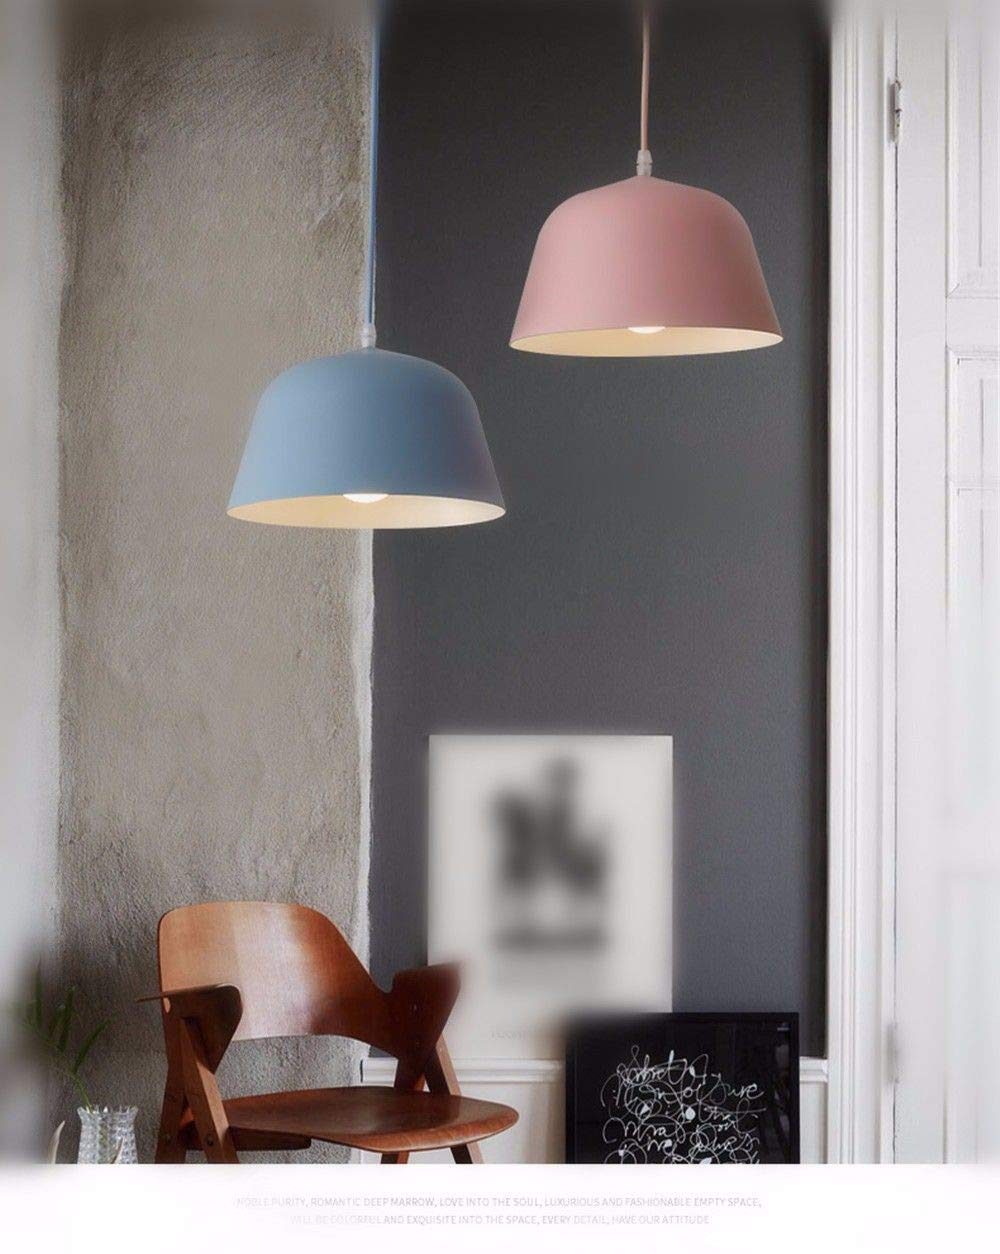 Full Size of Wohnzimmer Hängelampe Pendel Lampe Hngelampe Beleuchtung Lila Esszimmer Anbauwand Decken Lampen Großes Bild Teppiche Hängeleuchte Deckenlampen Für Wohnzimmer Wohnzimmer Hängelampe